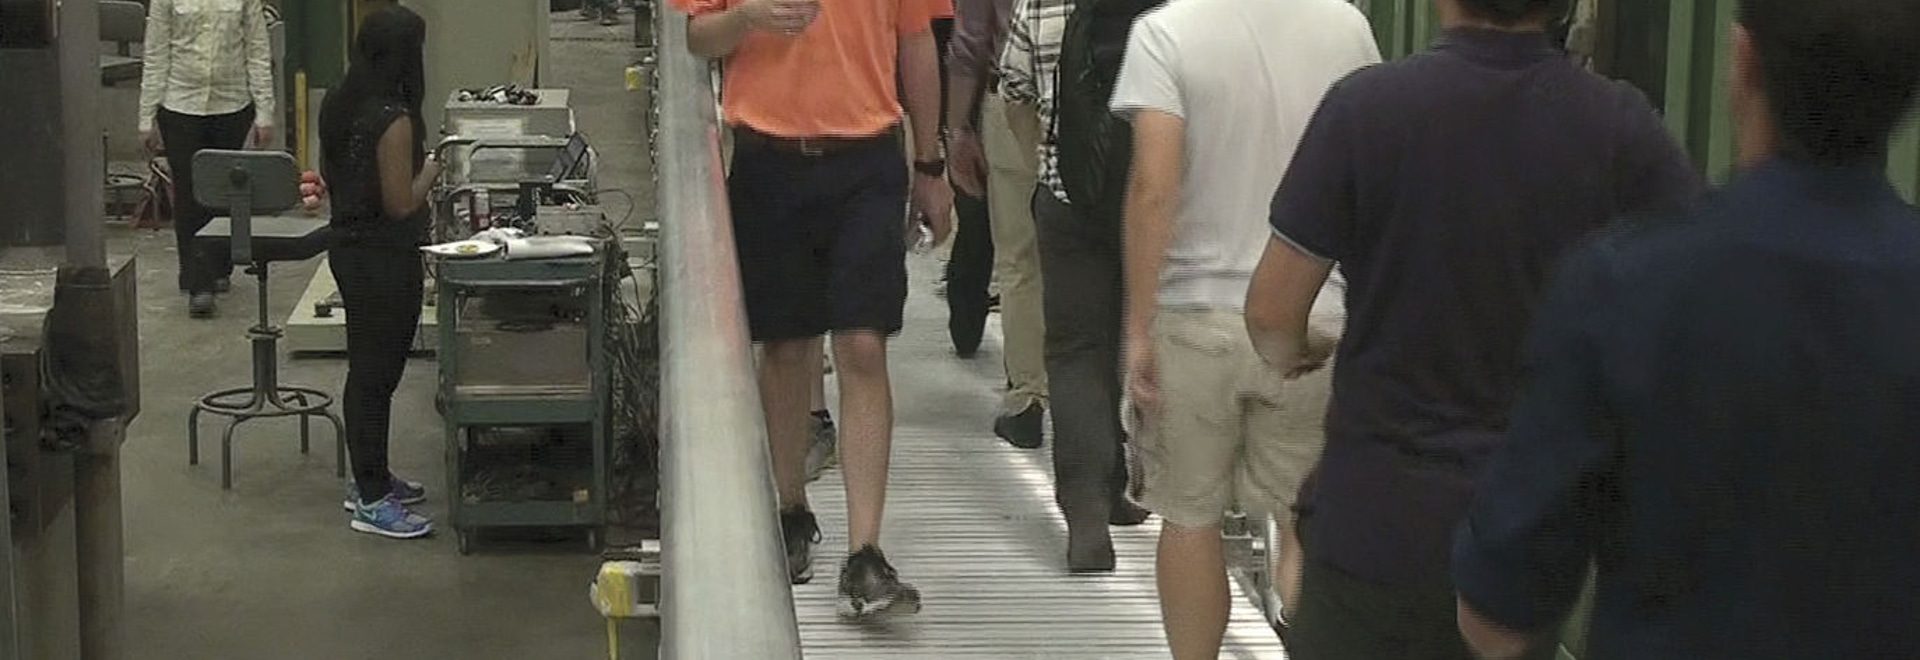 Make-A-Bridge® weld-free aluminum pedestrian bridge undergoes vibration tests at University of Waterloo, Ontario, Canada